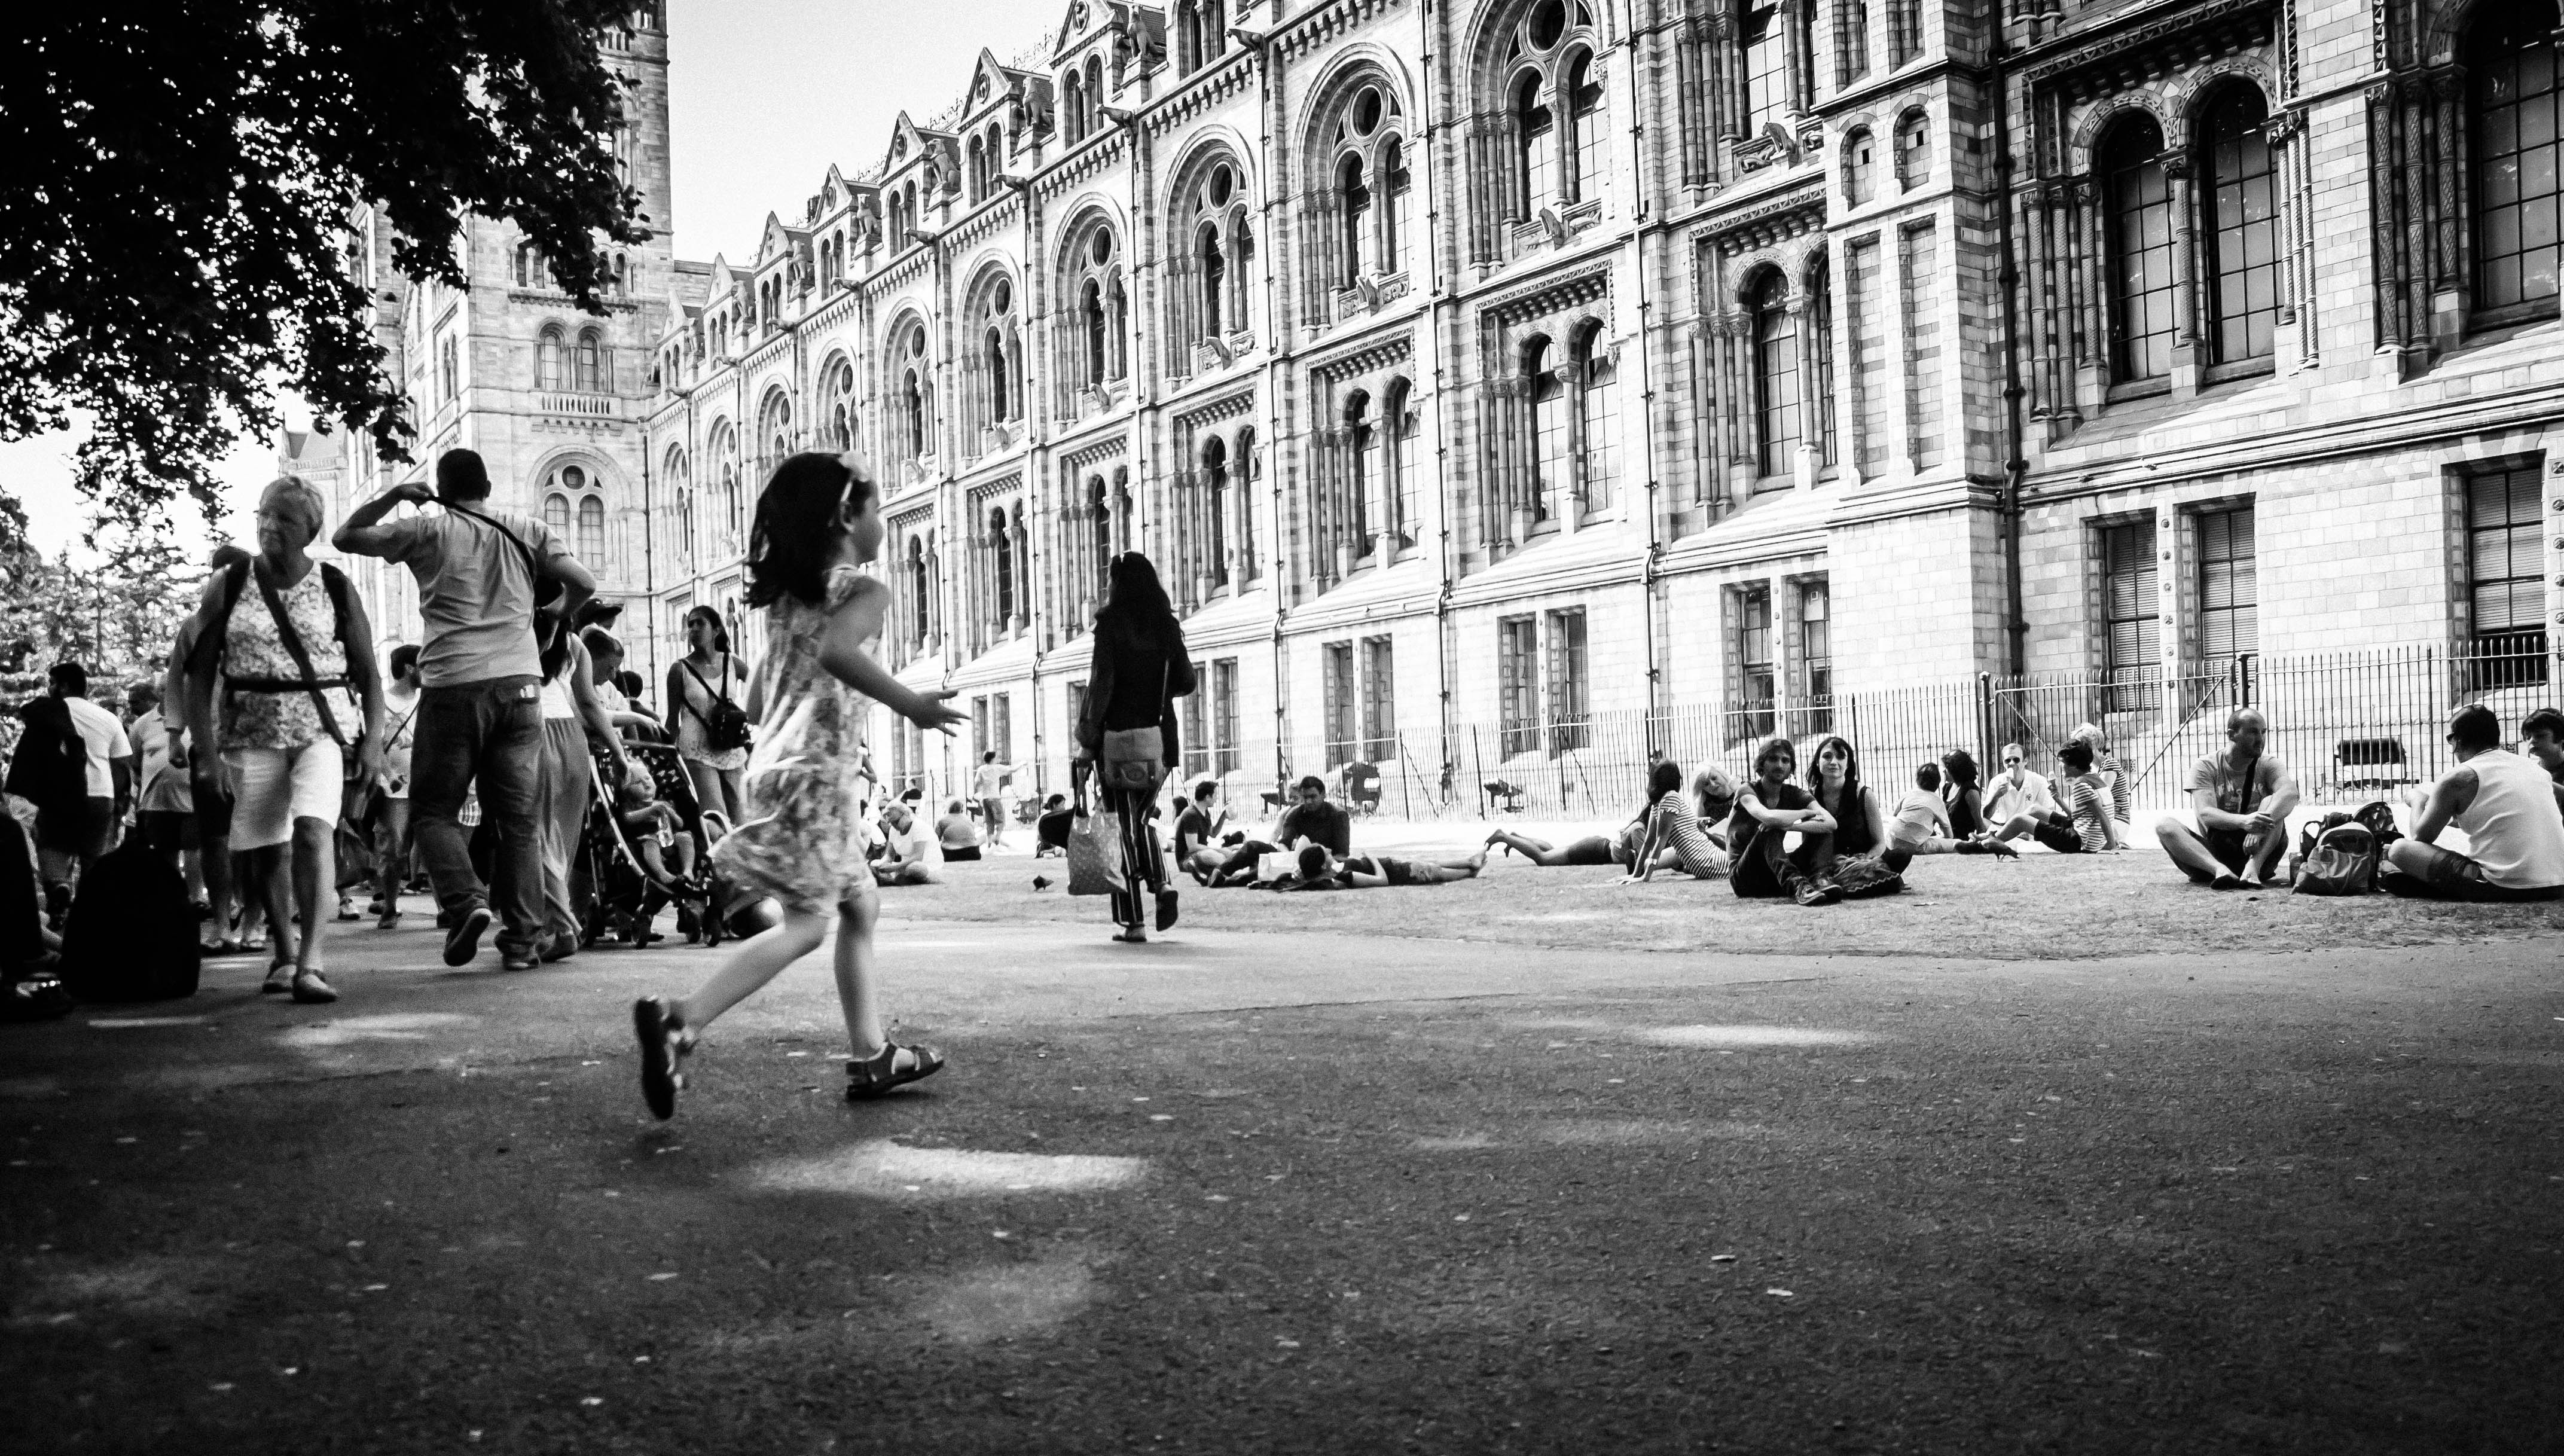 Flickr - Random shooting : motion aesthetic.jpg